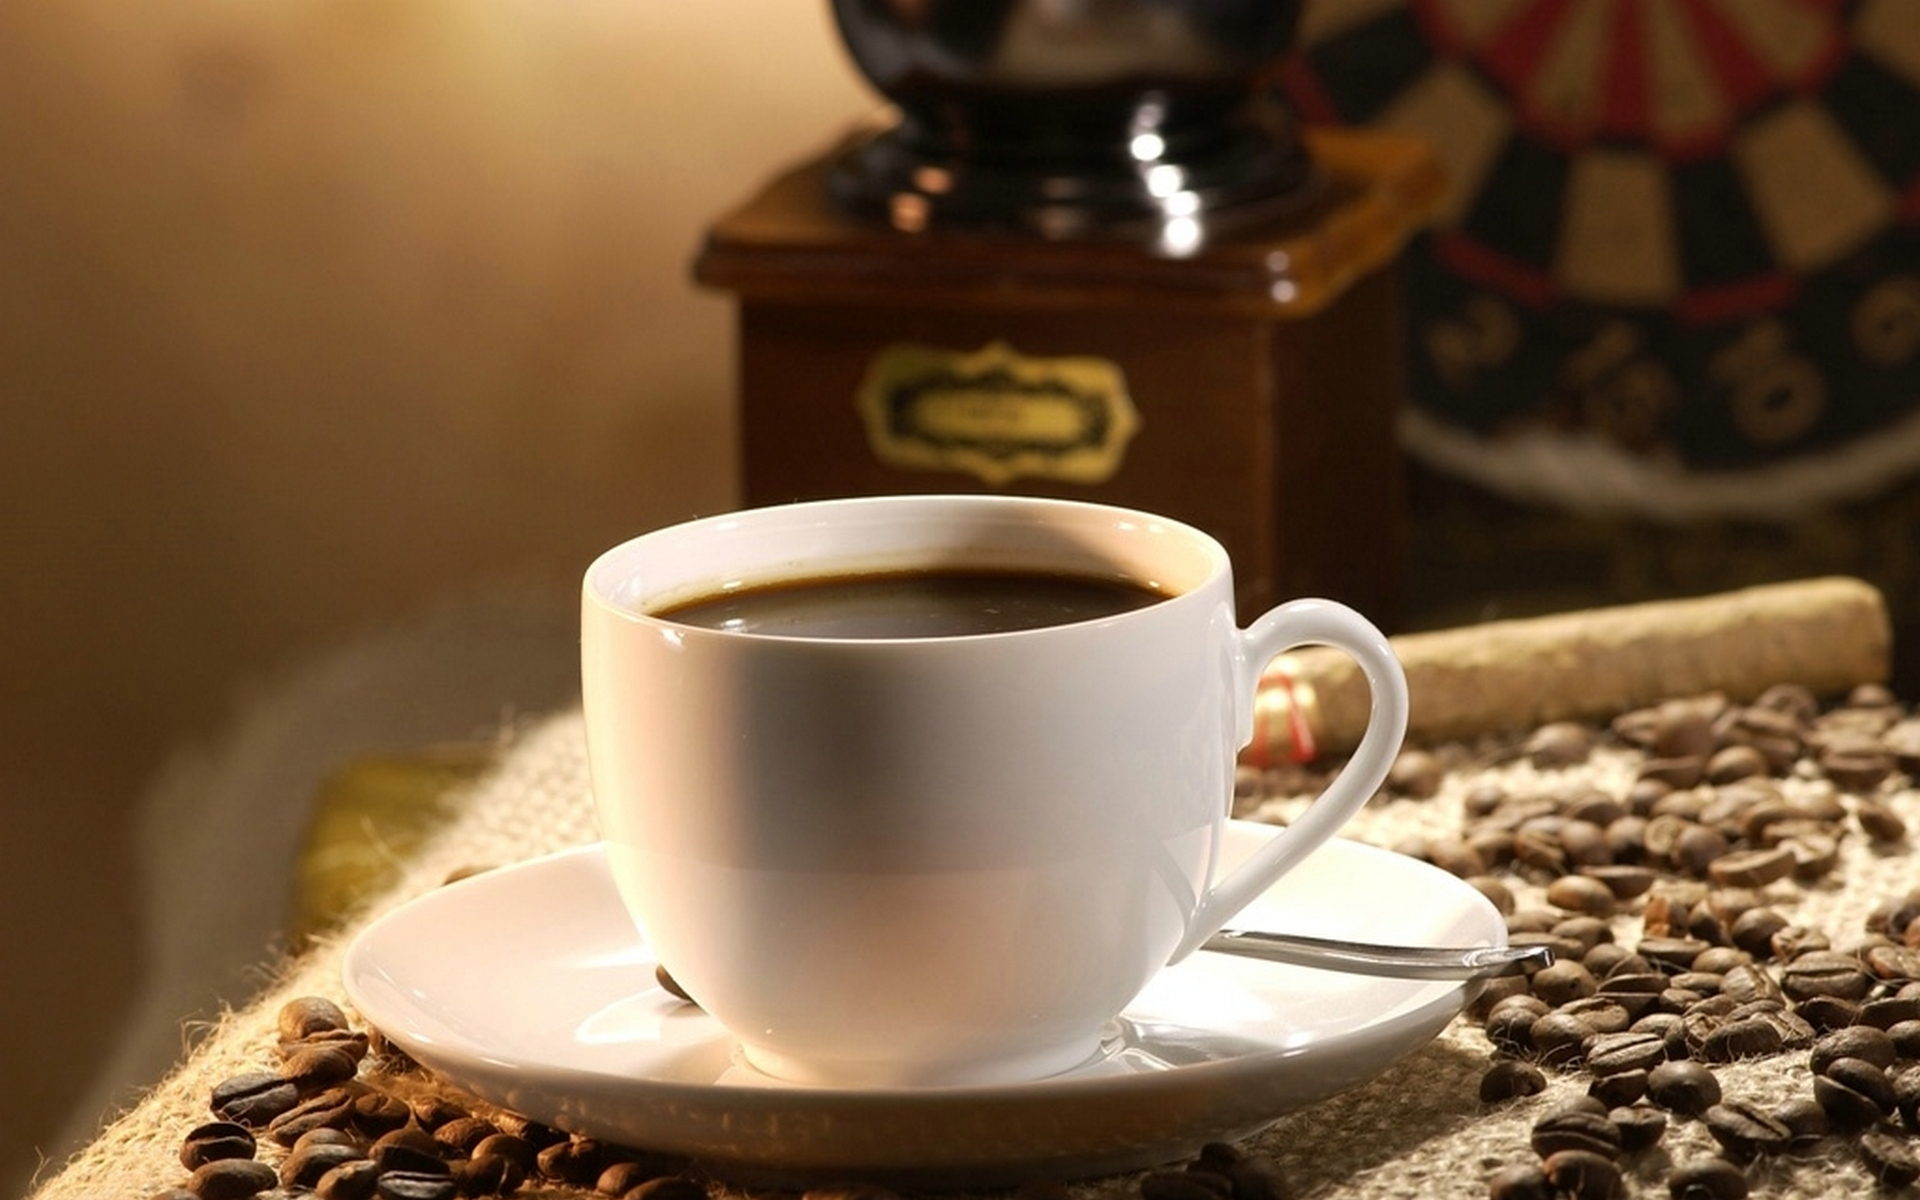 чашка, кофе, зерна